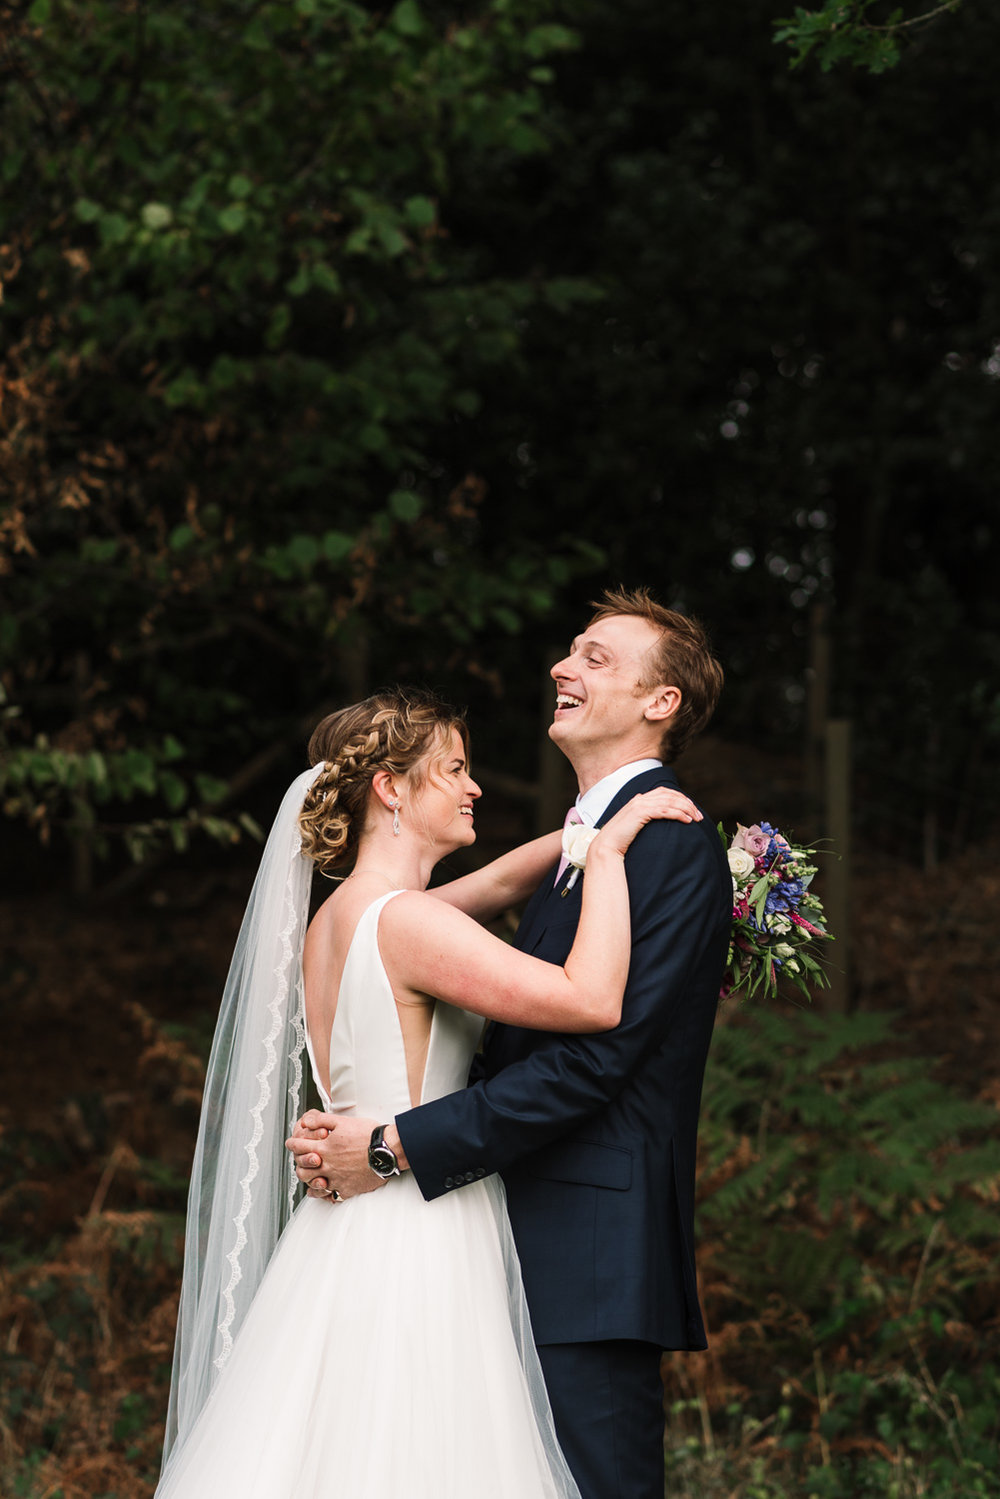 frensham-wedding-photographer-43.jpg